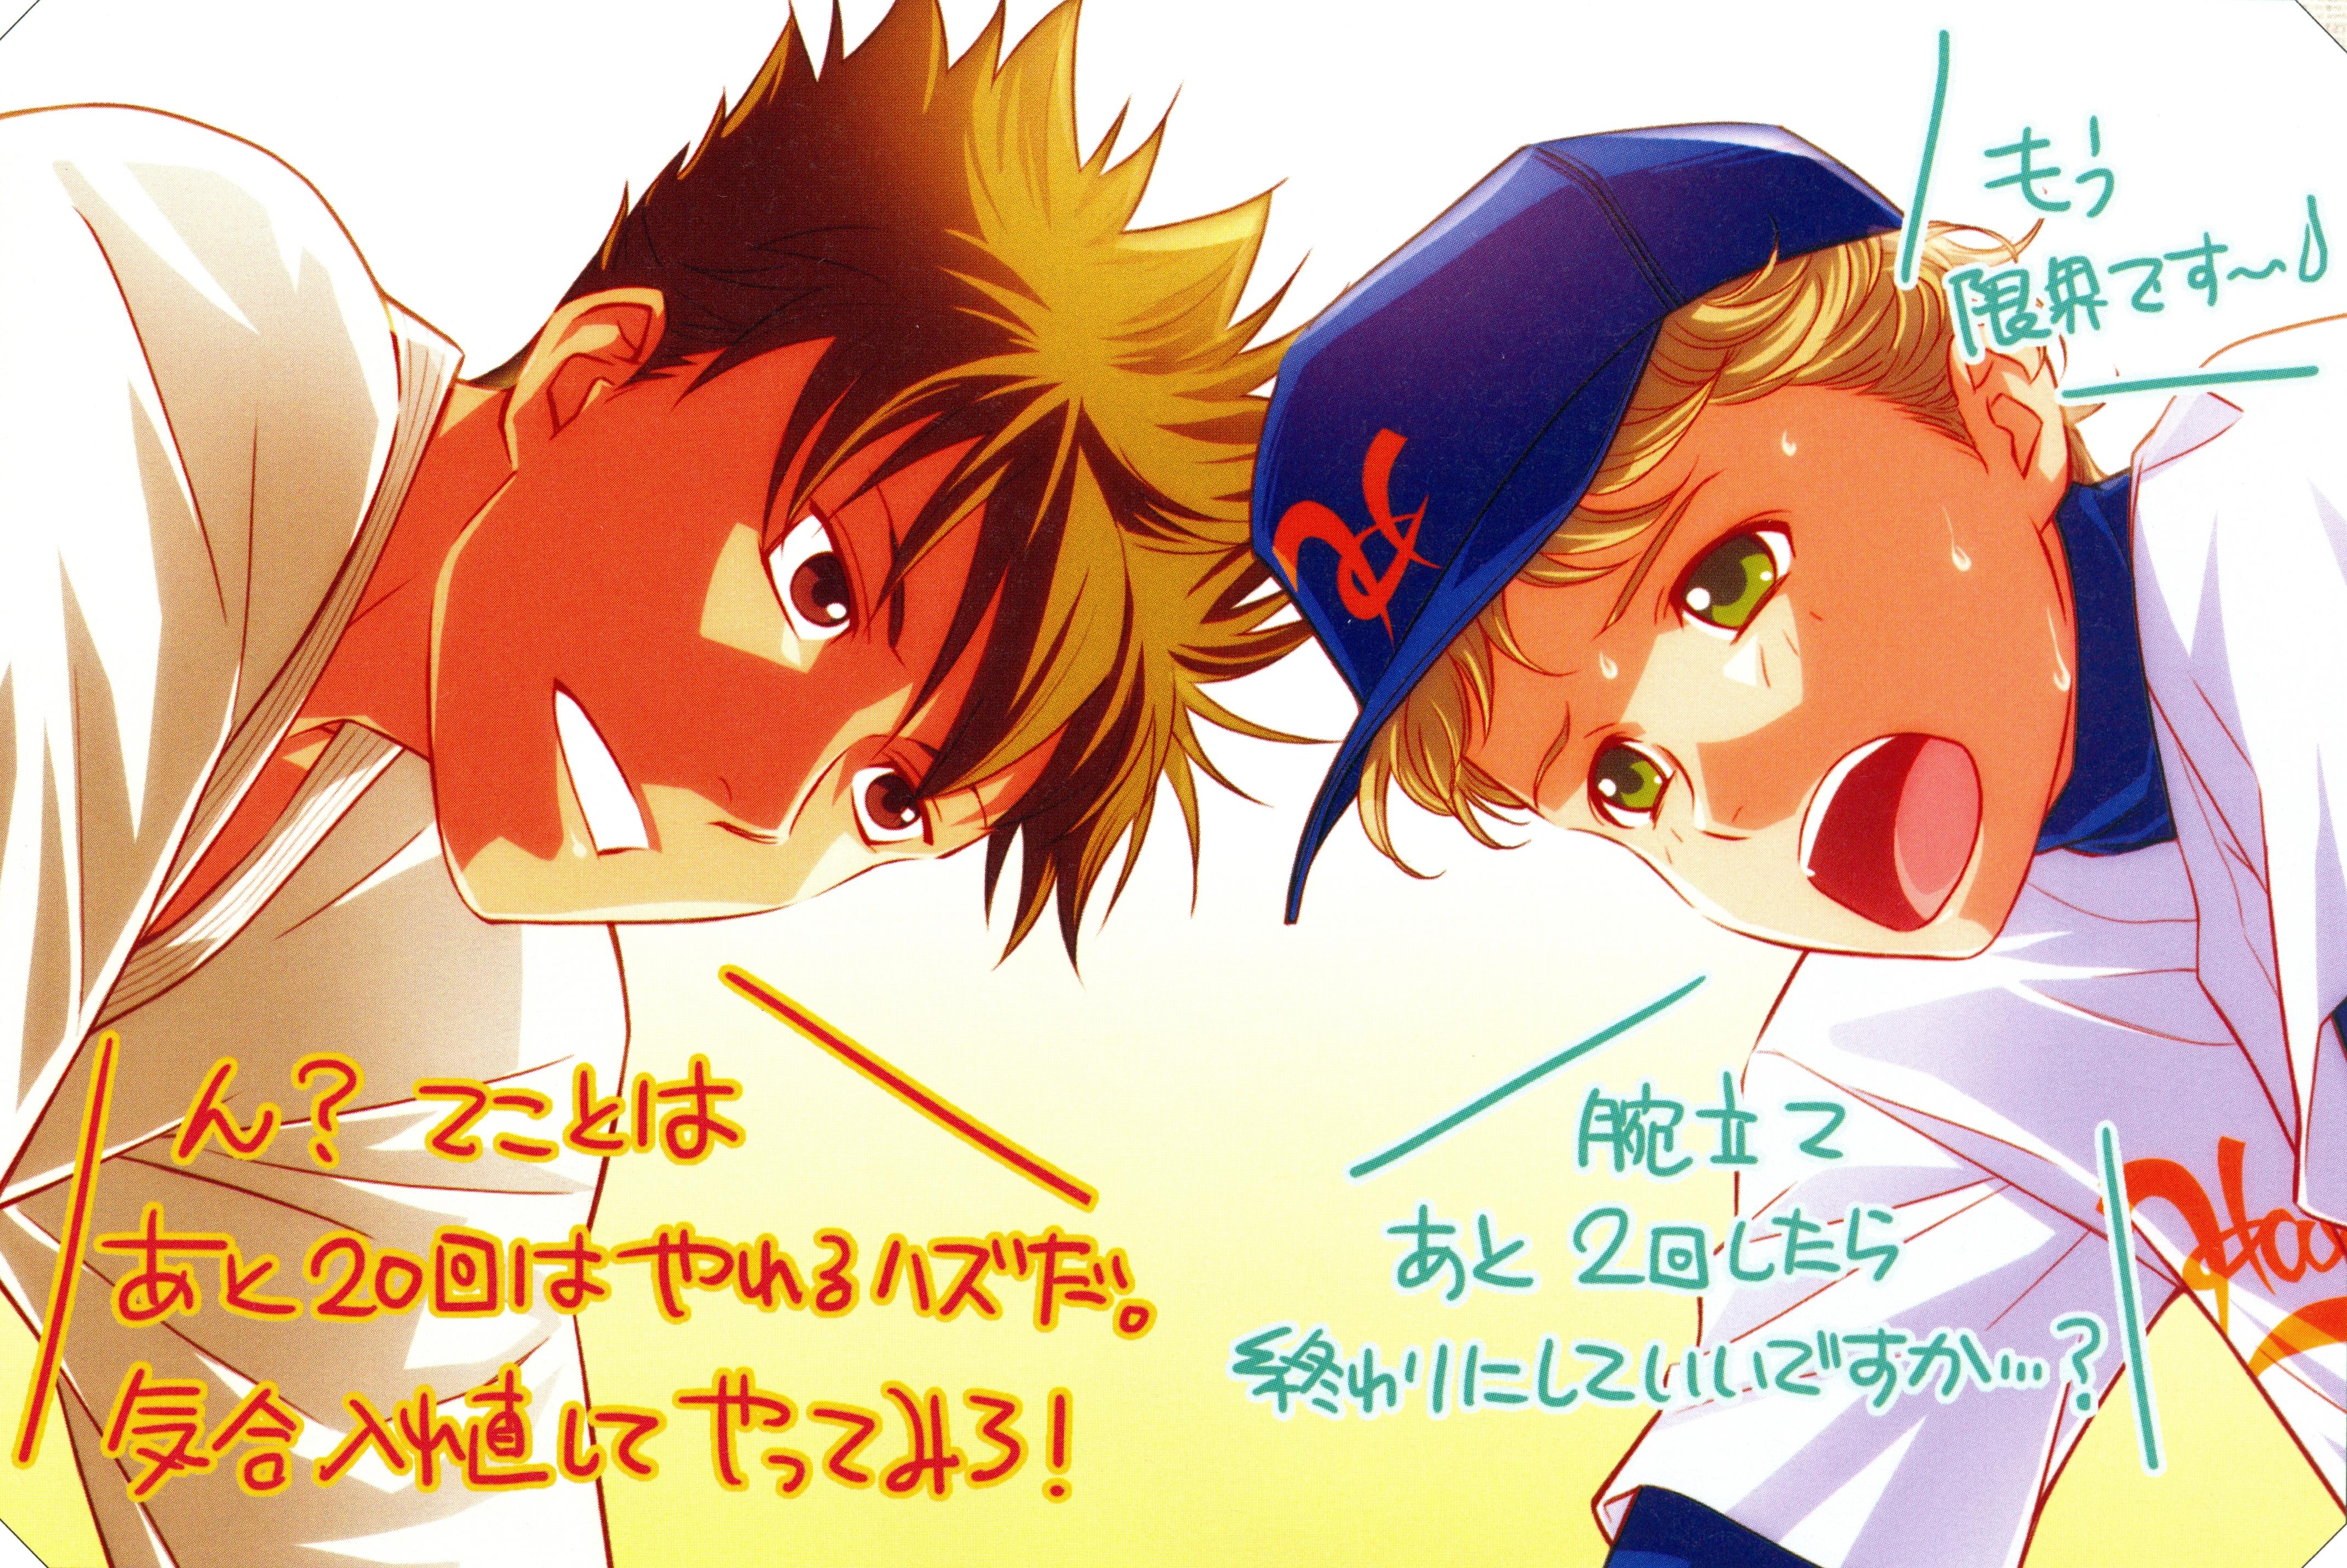 Tokimeki Memorial Girl S Side 1st Love Image 2233973 Zerochan Anime Image Board